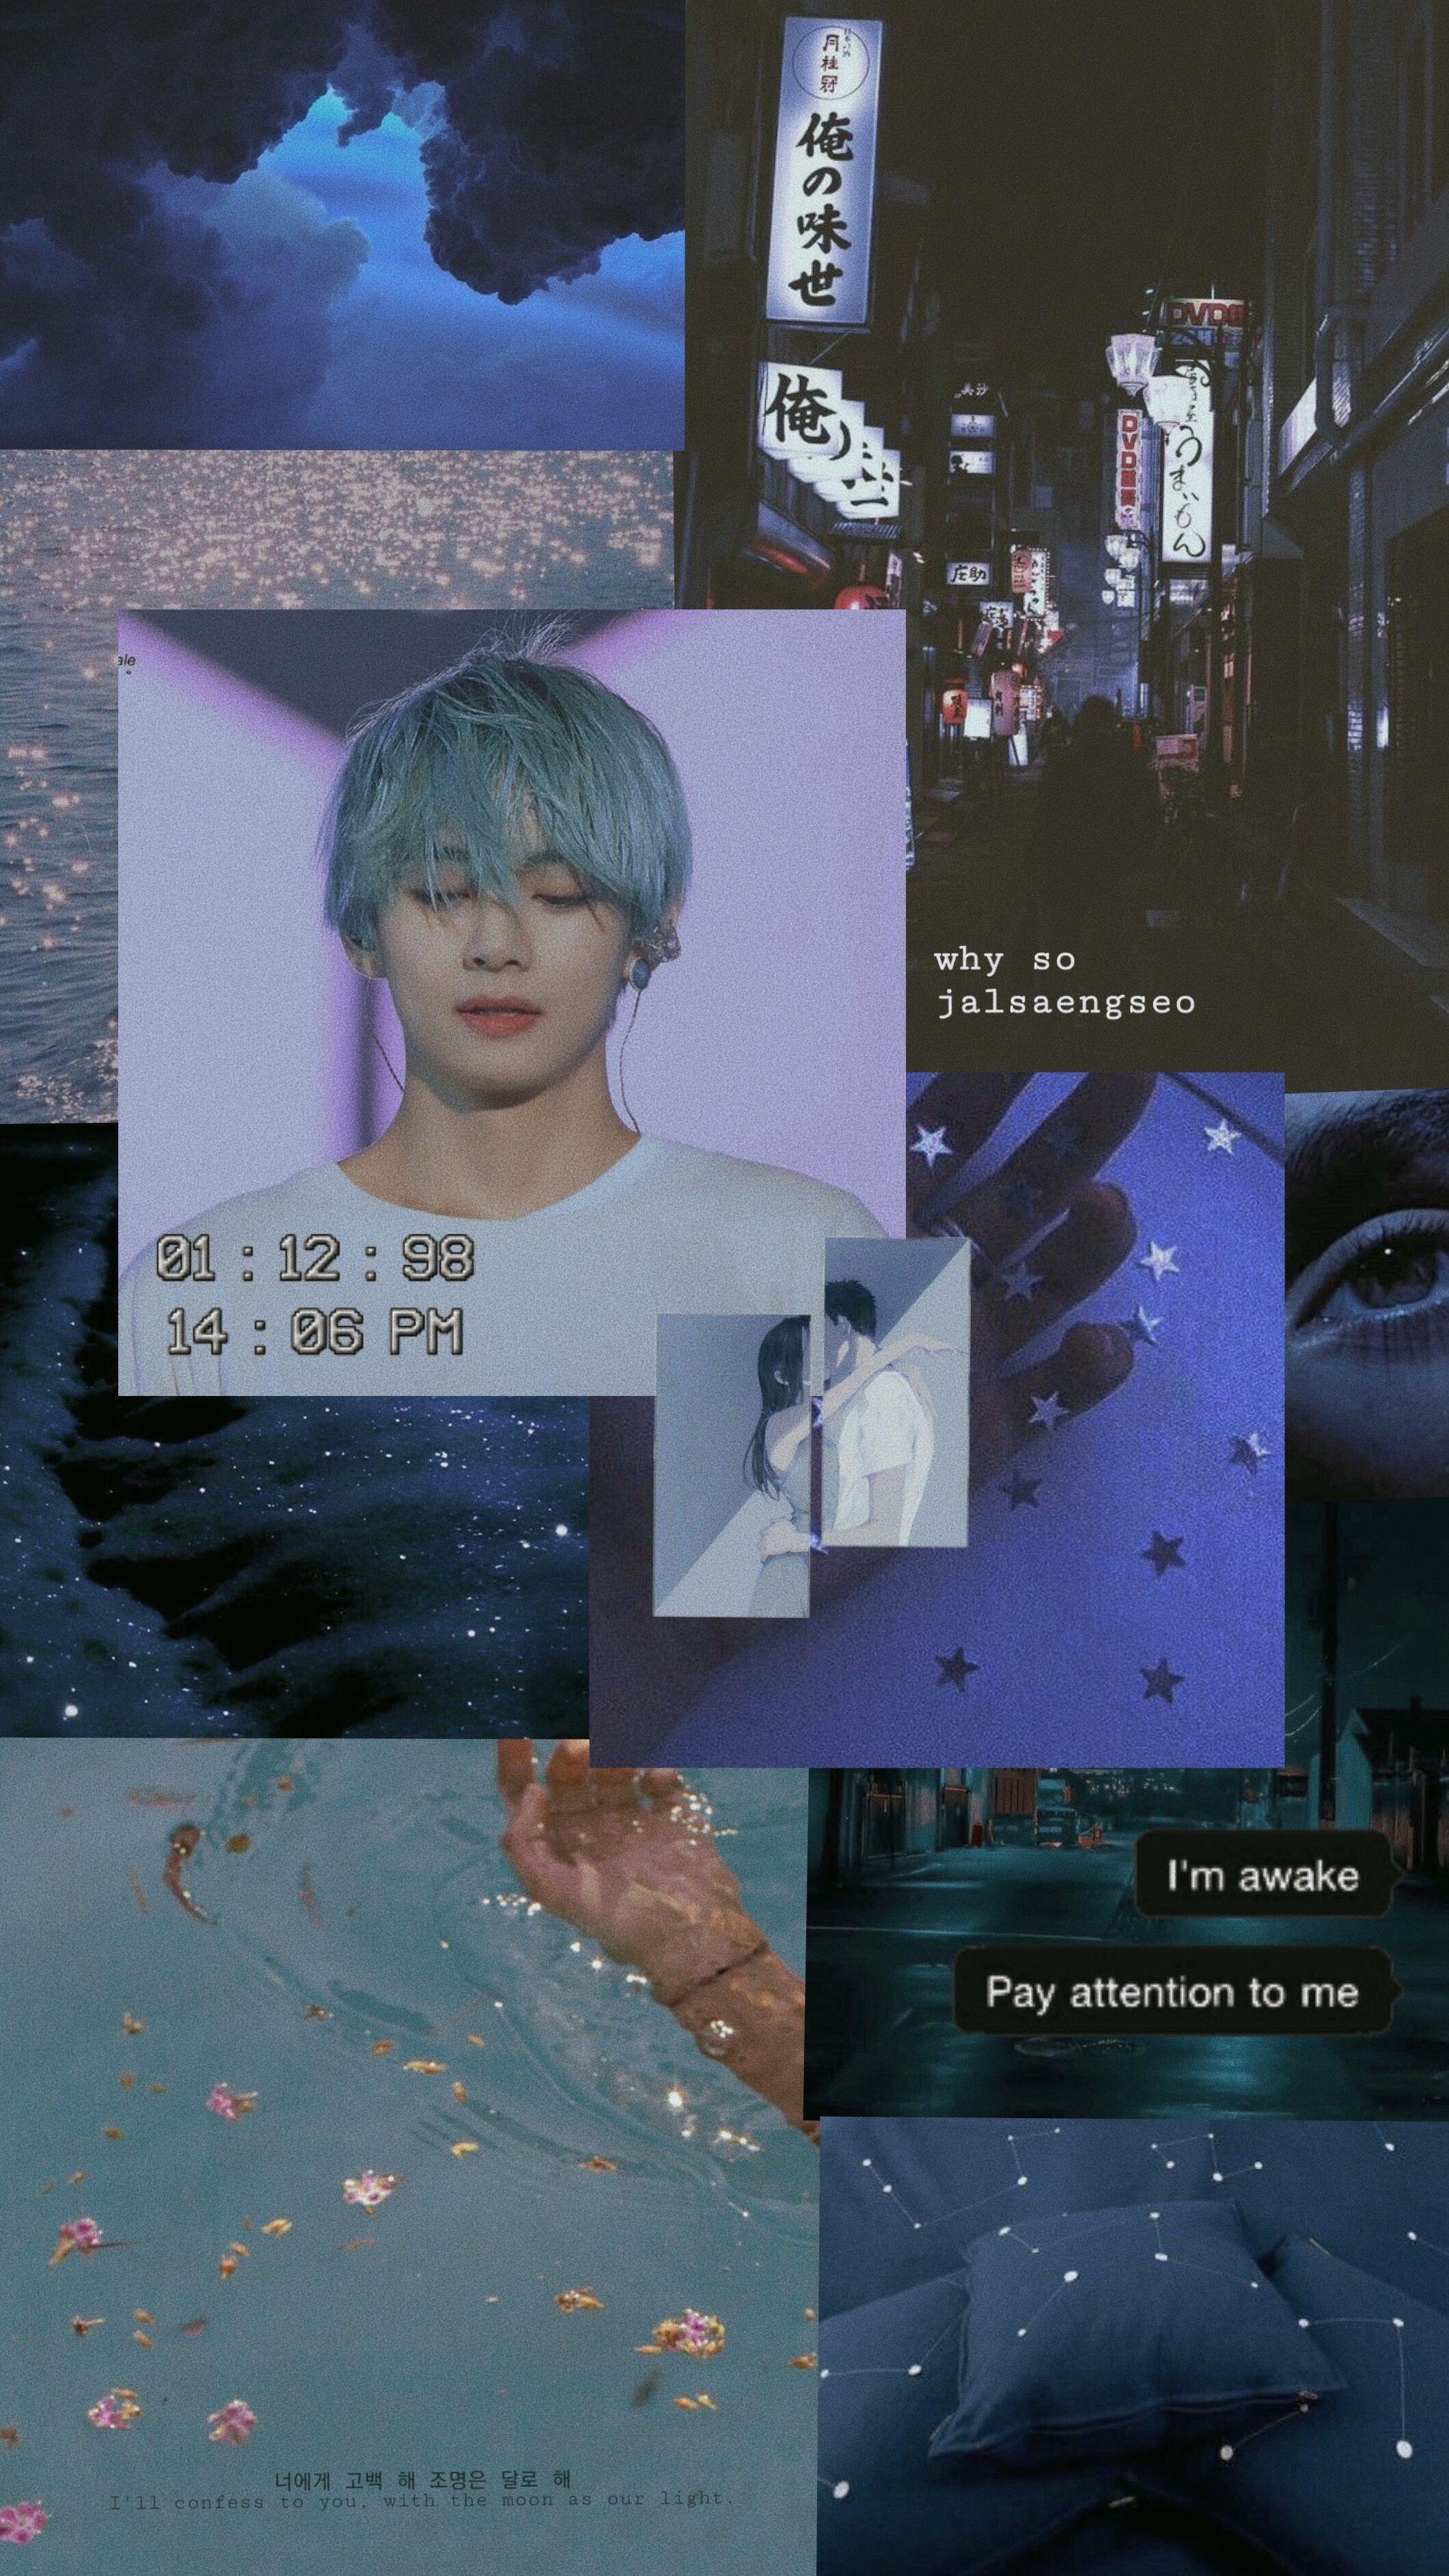 V Kim Taehyung Bts Blue Aesthetic Wallpaper Blue Aesthetic Aesthetic Wallpapers Kim Taehyung Wallpaper